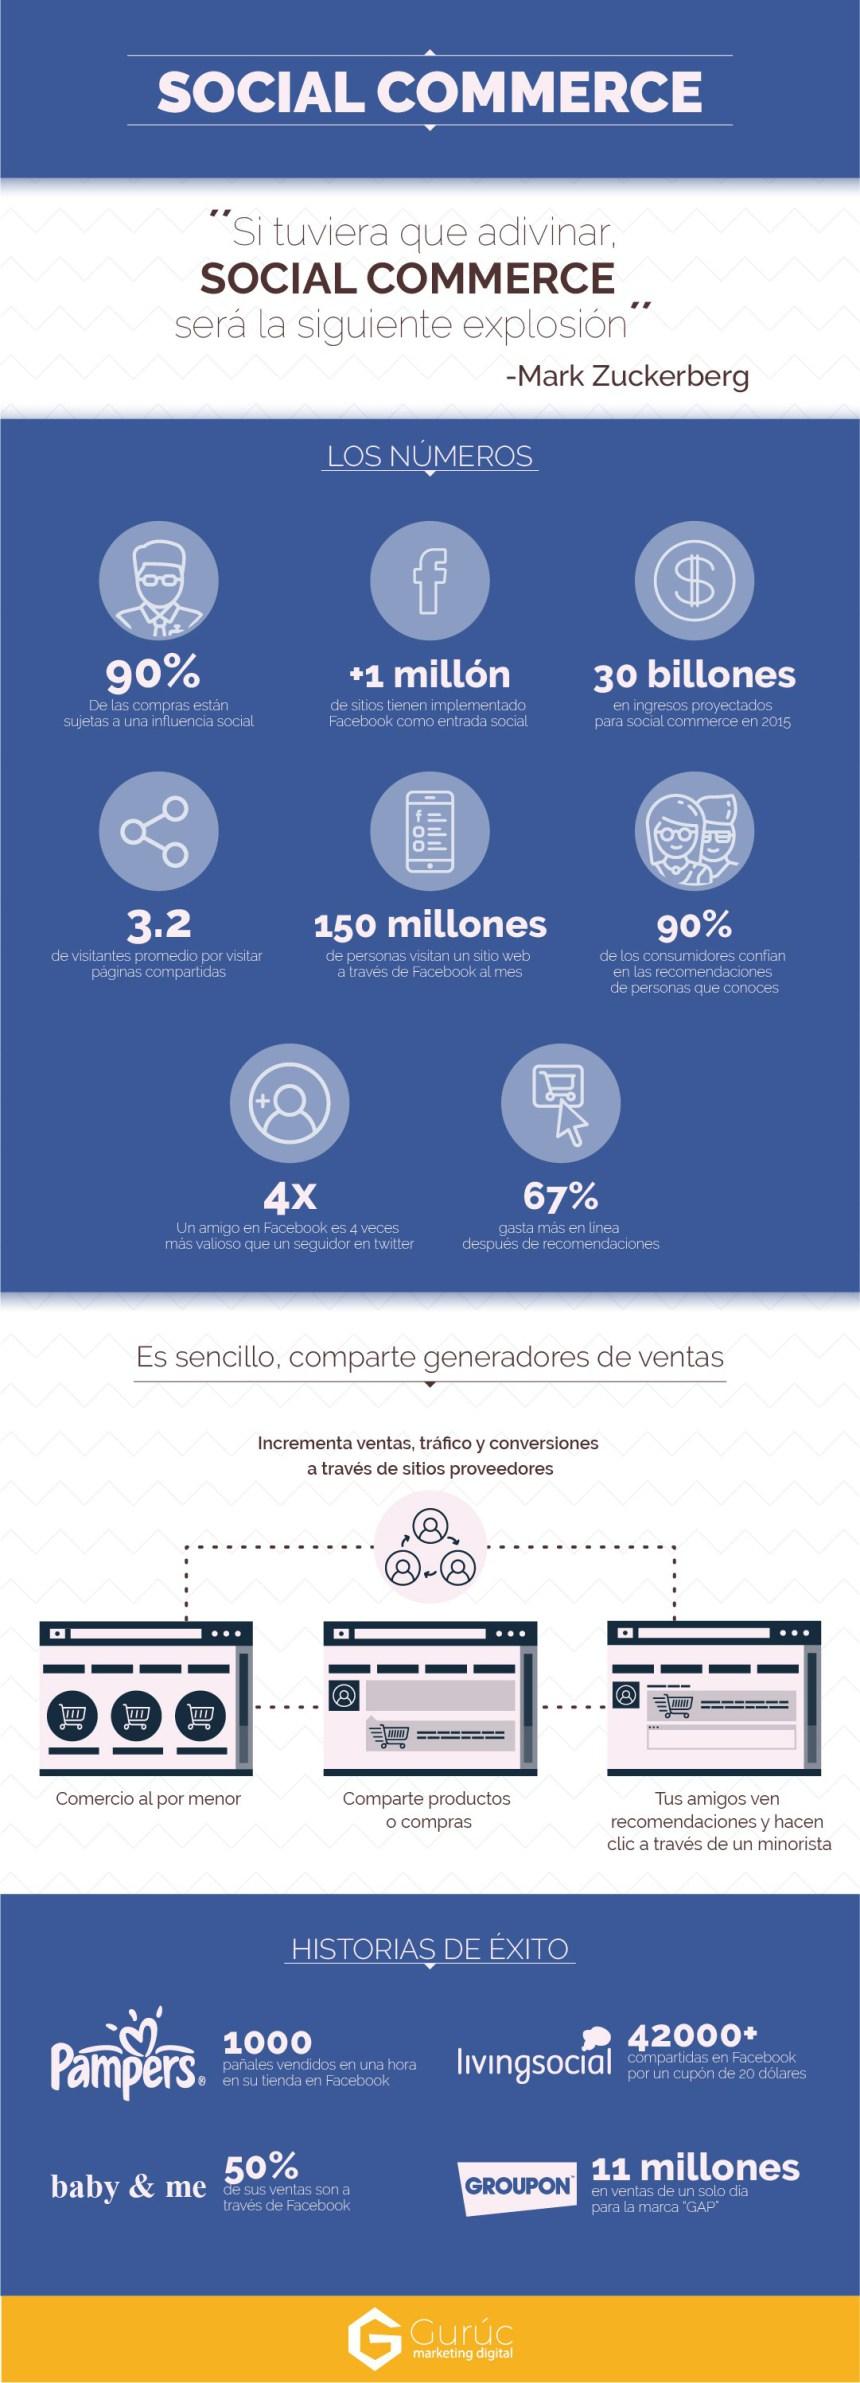 Social Commerce #infografia #infographic #ecommerce #socialmedia